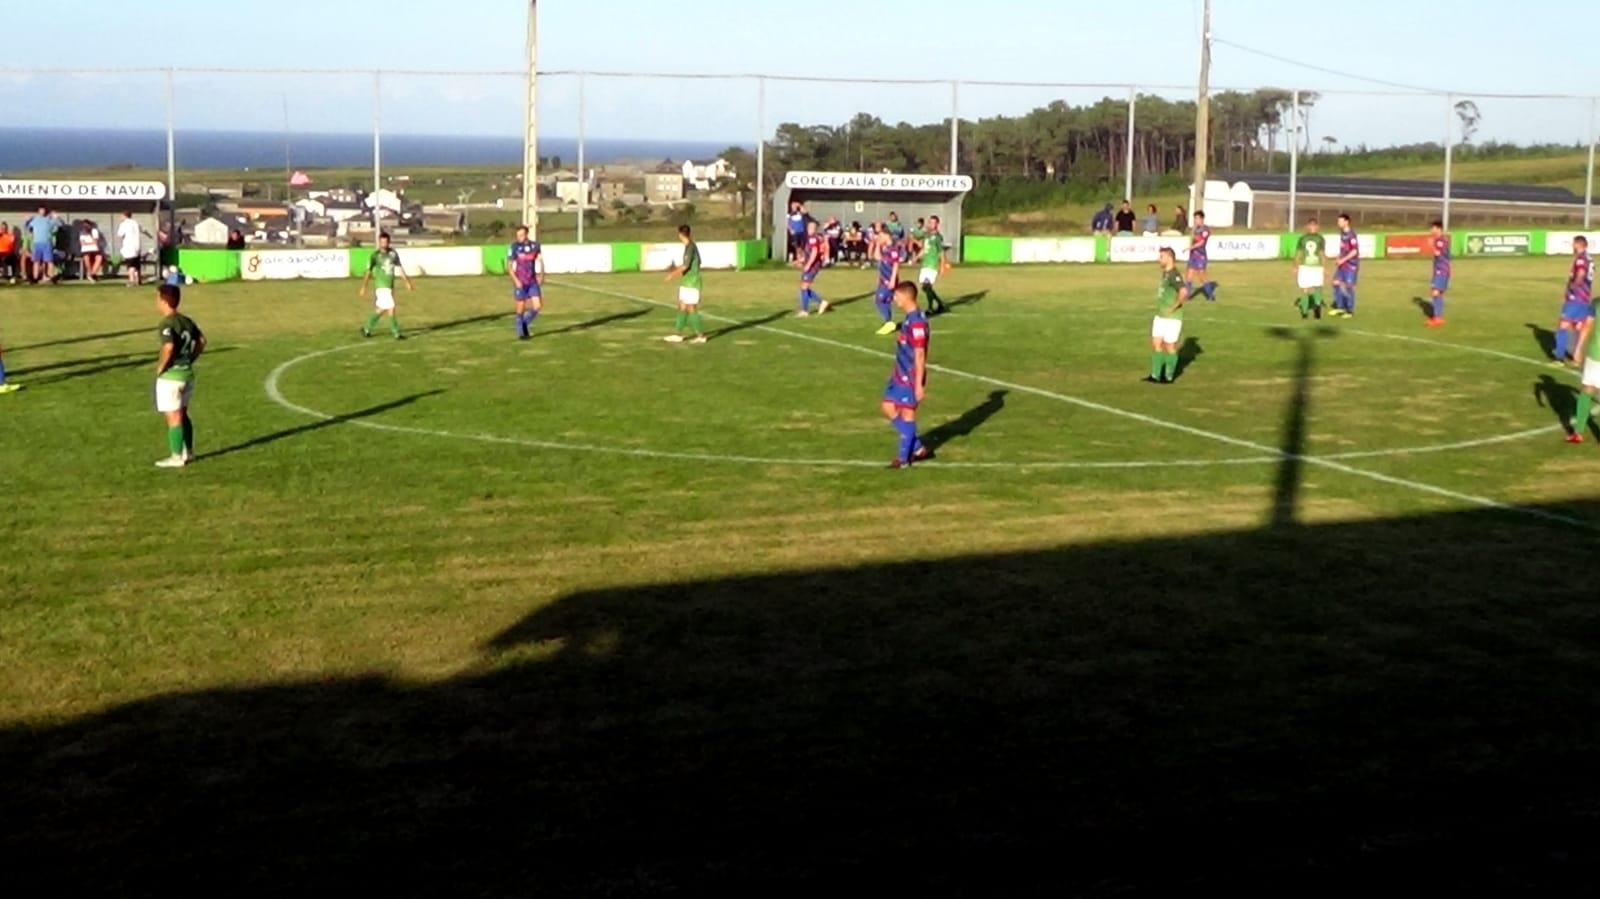 El Puerto de Vega ya es tercero tras vencer al Andés por 3-2